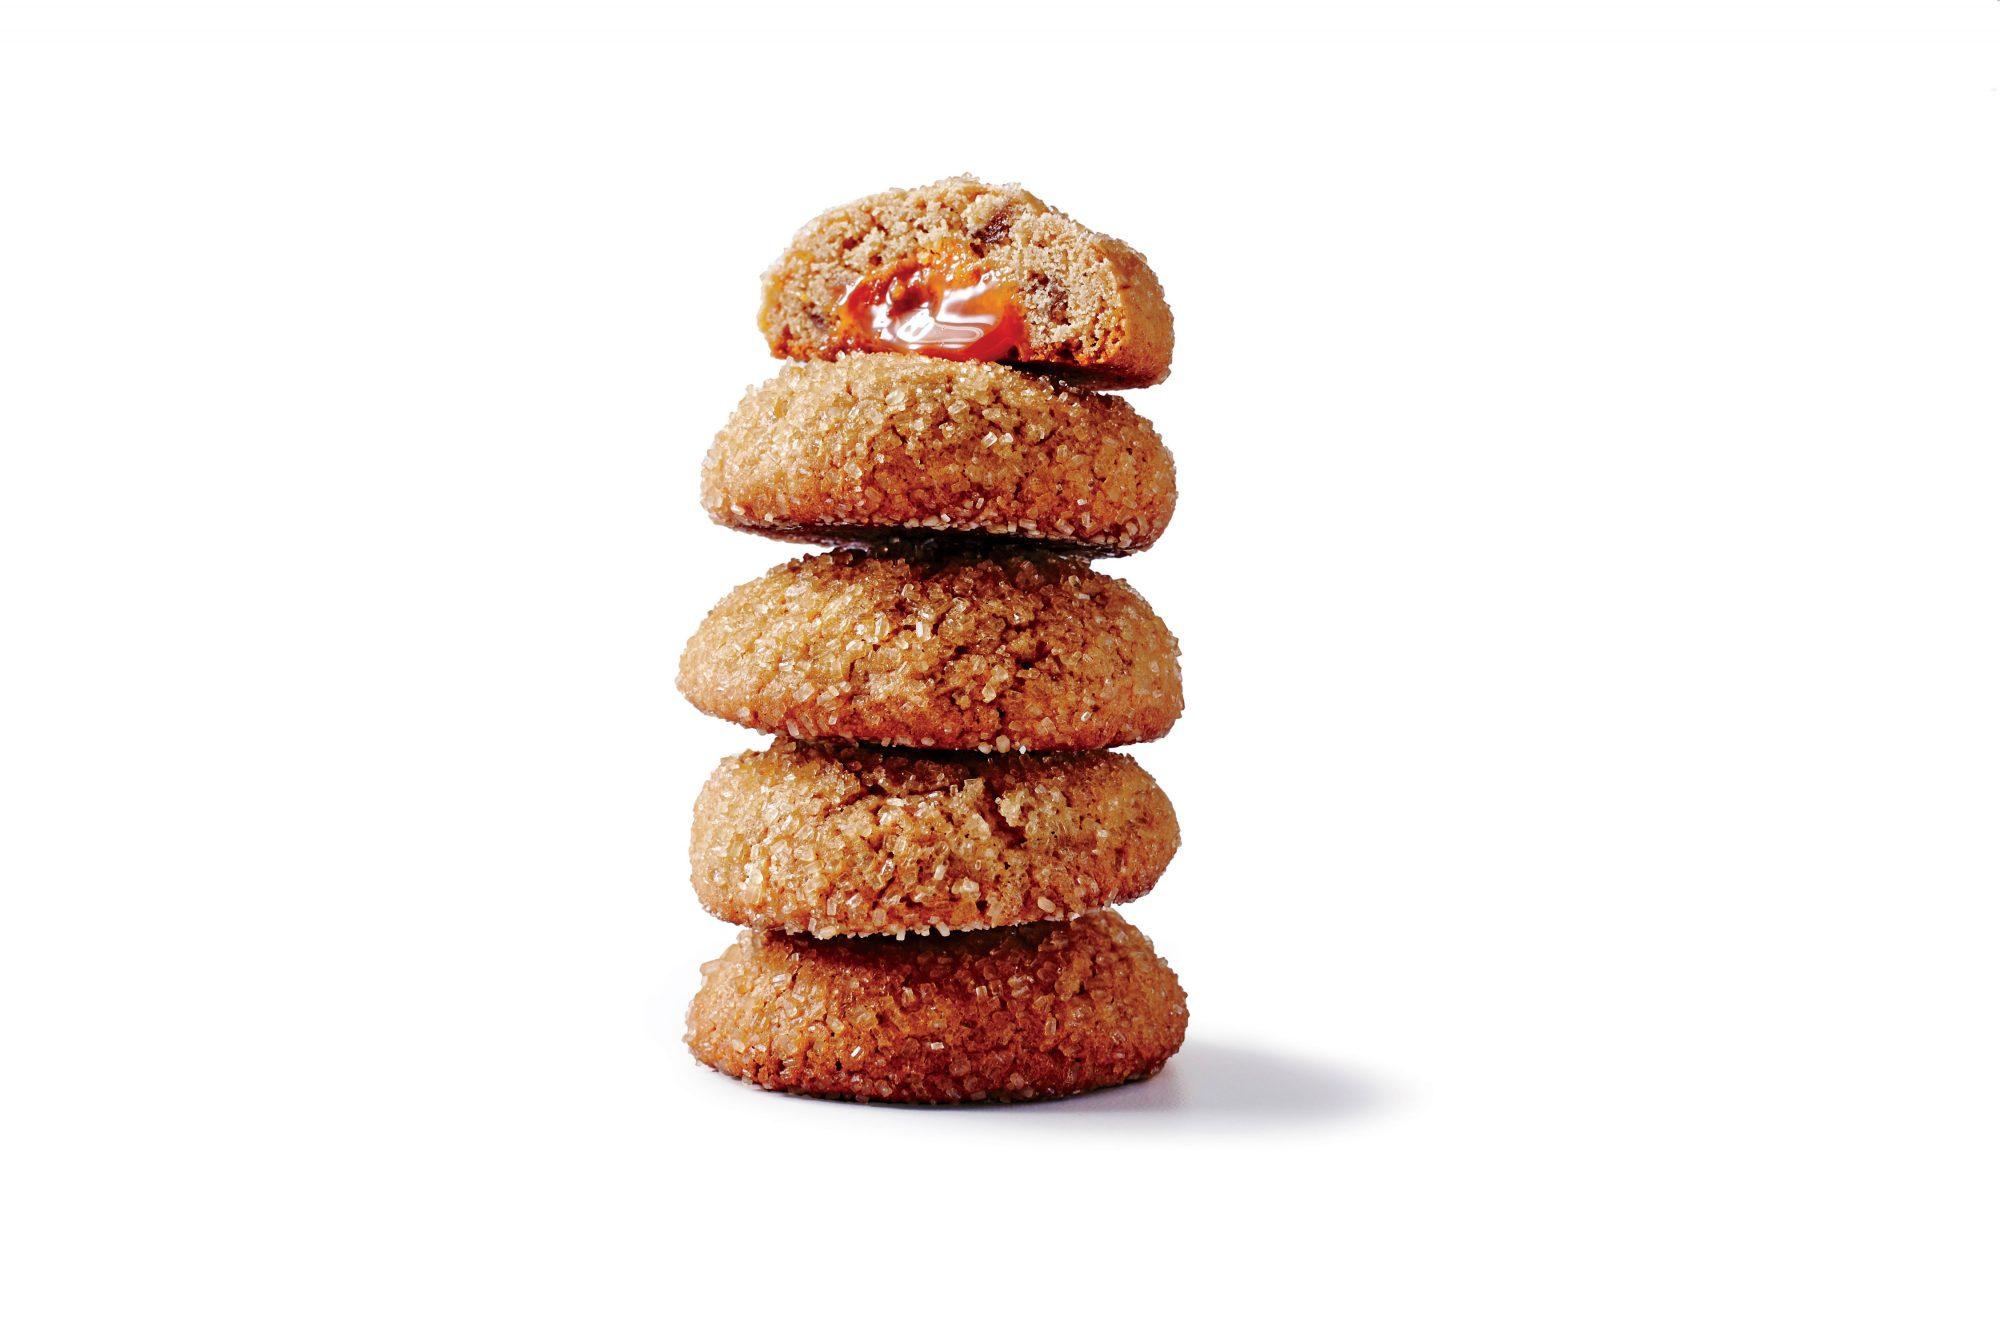 Caramel-Stuffed Ginger Cookies image